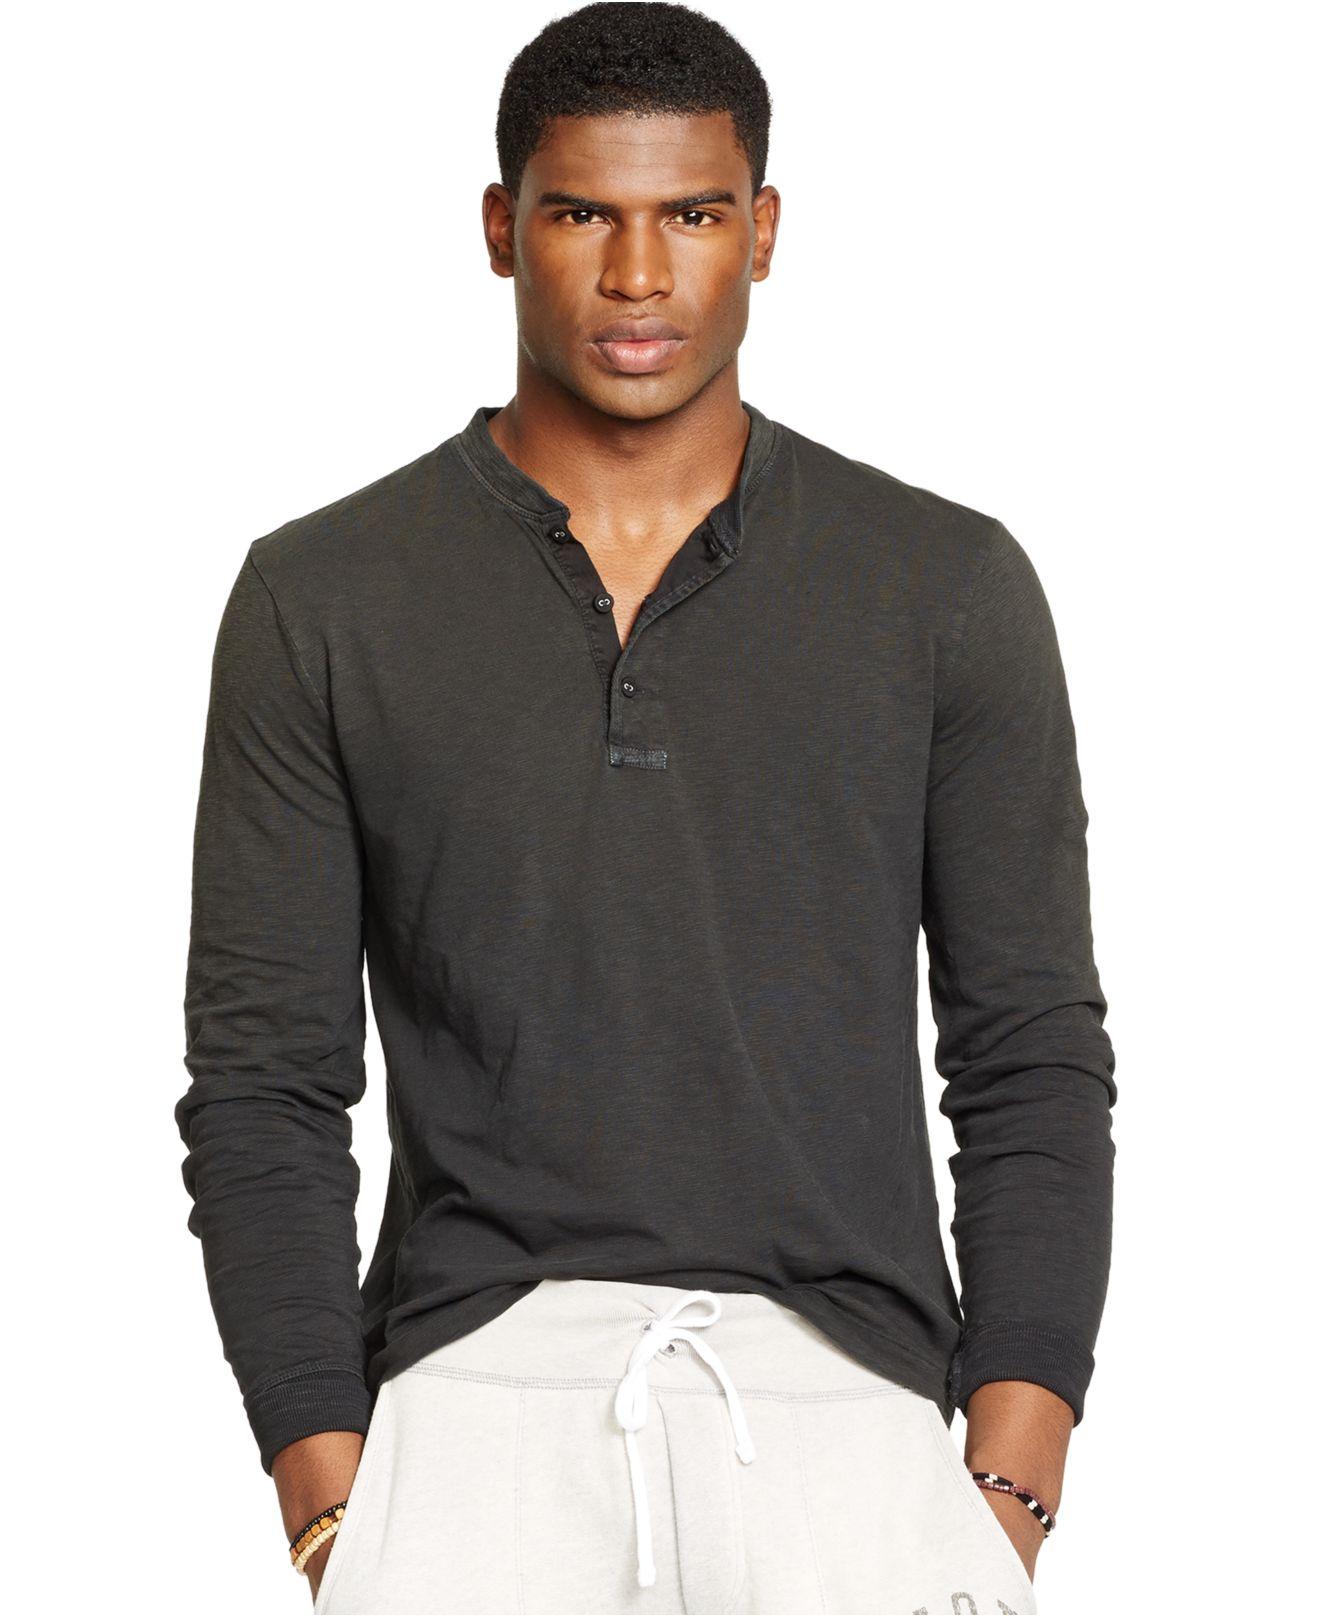 750919b33 ... cheapest lyst polo ralph lauren textured henley shirt in black for men  57783 8af91